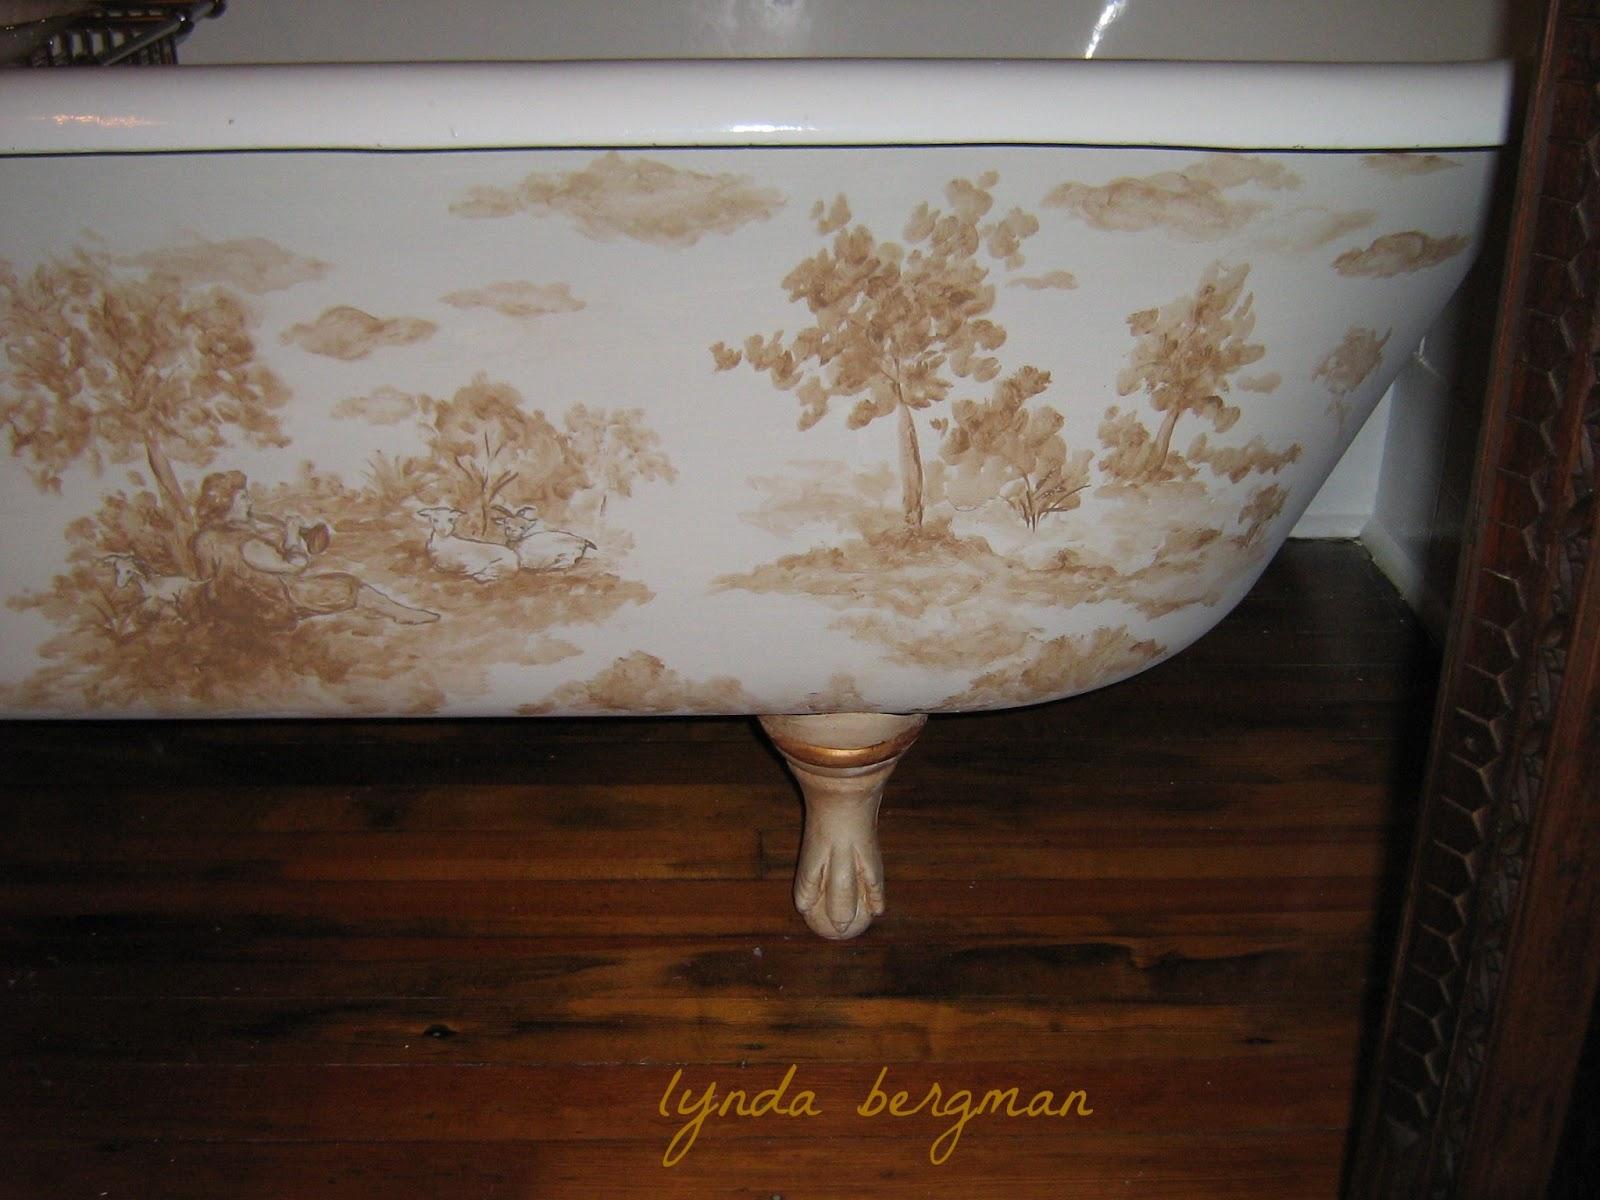 lynda bergman decorative artisan hand painted toile rural scene on a clawfoot bathtub. Black Bedroom Furniture Sets. Home Design Ideas